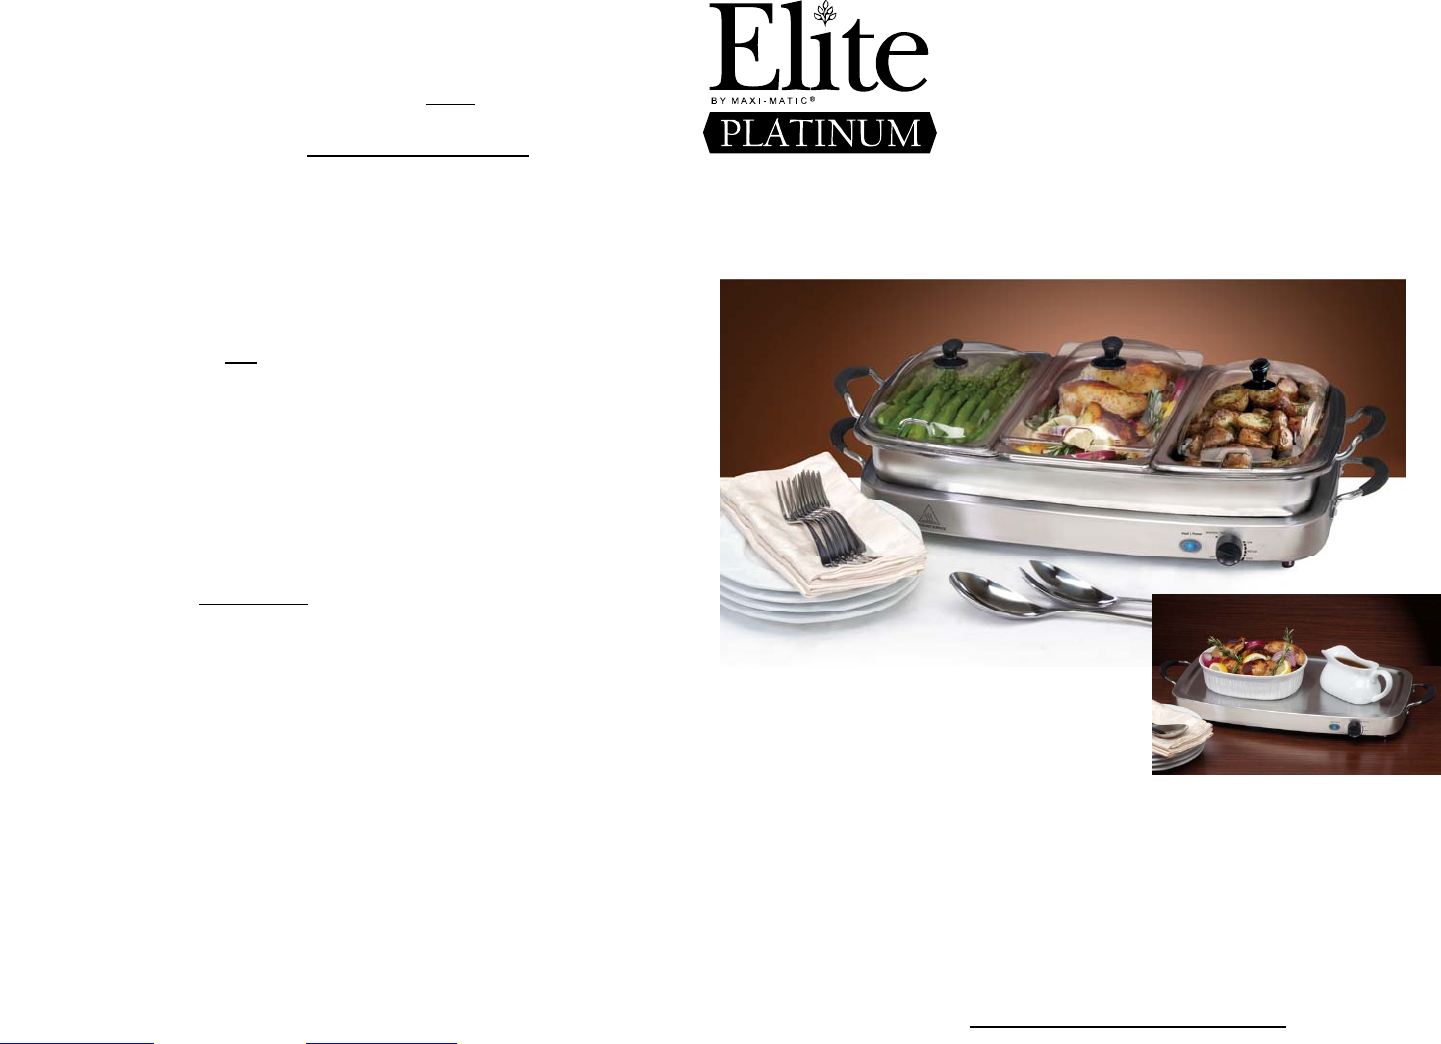 Maximatic Elite Platinum Ewm 9933 Users Manual Warranty